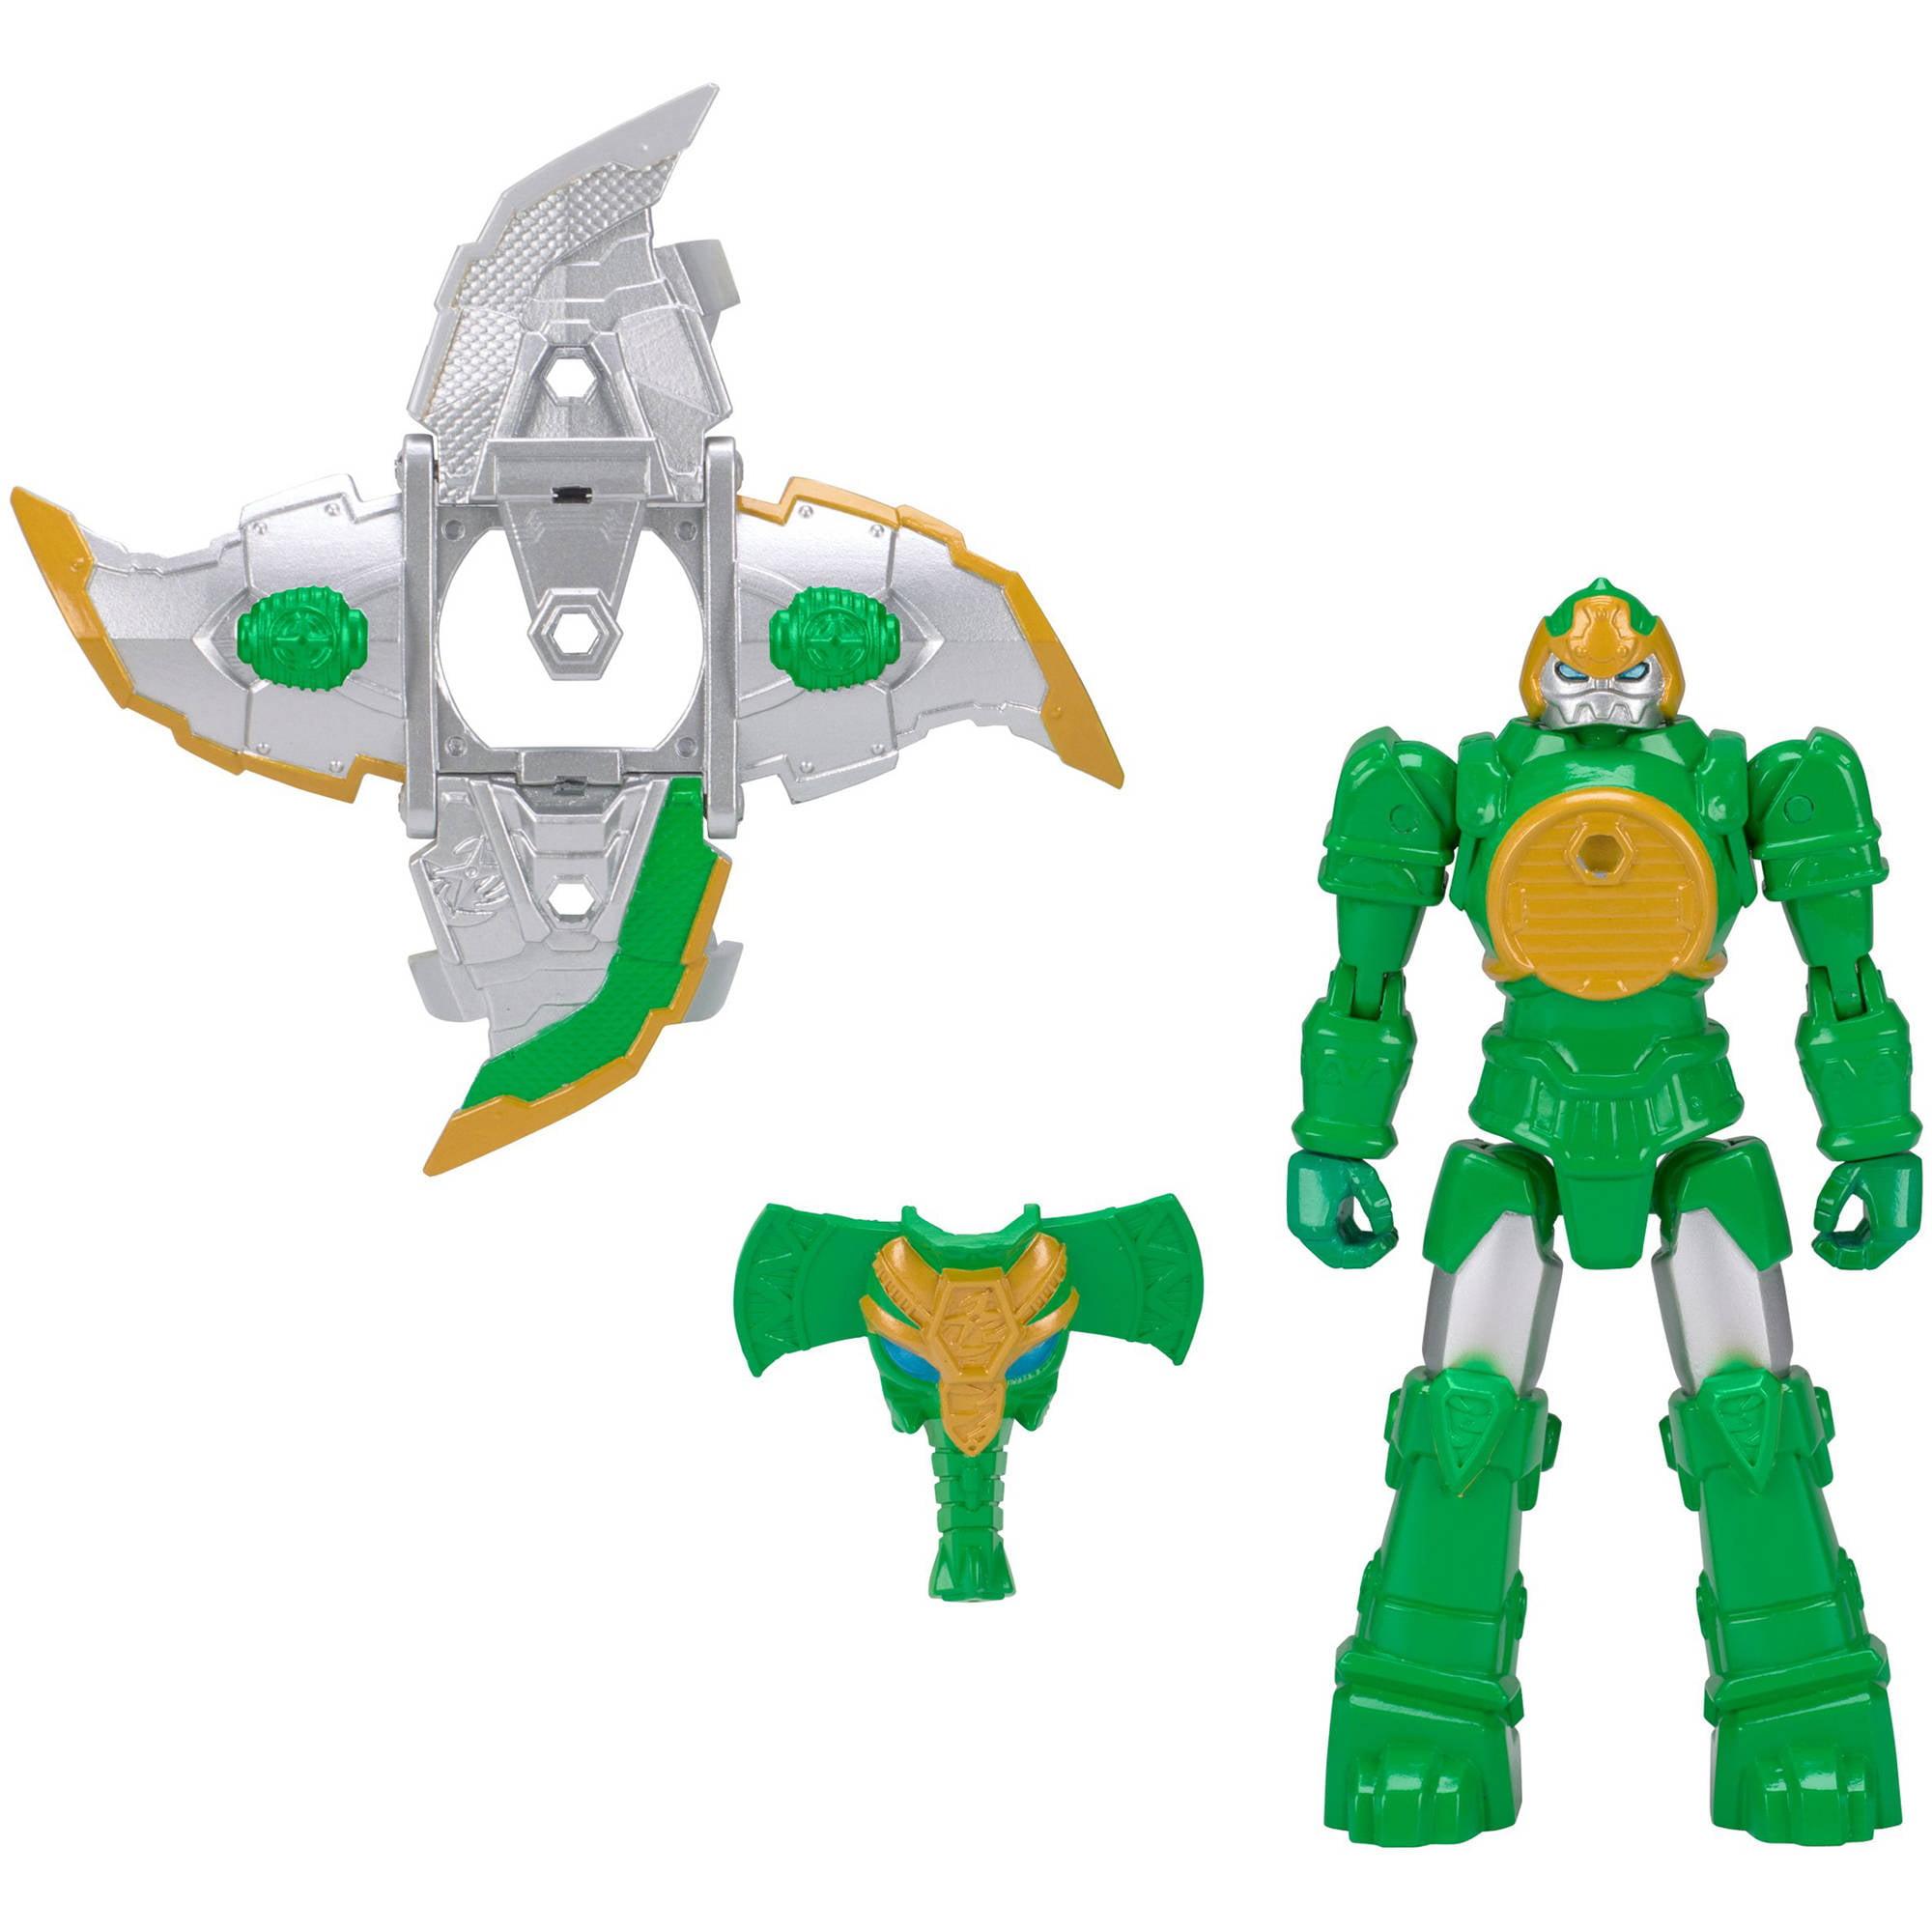 Power Rangers Ninja Steel DX Rumble Tusk Zord